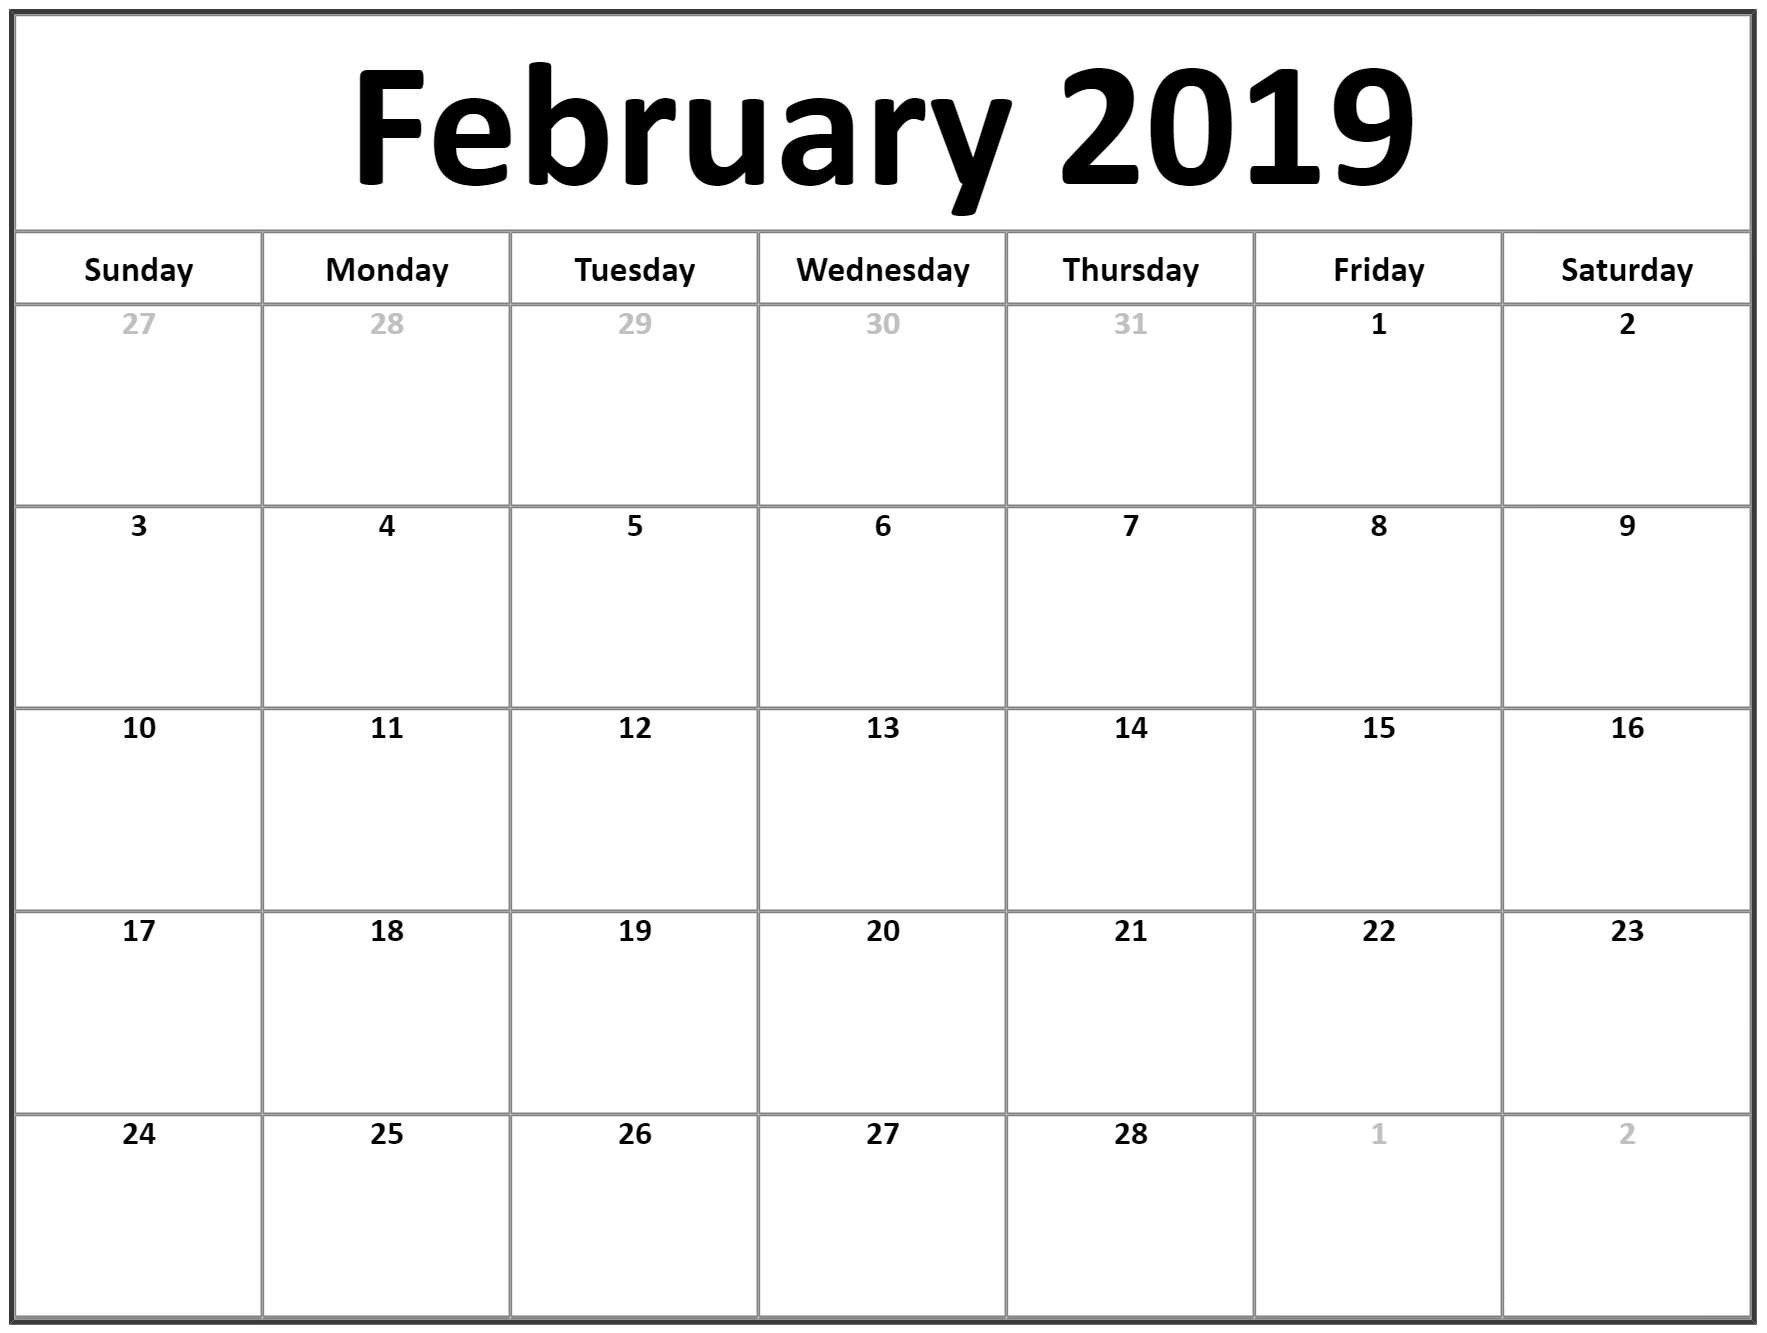 Retirement Calendar Countdown Printable - Calendar Templates Retirement Countdown Calendar Printable